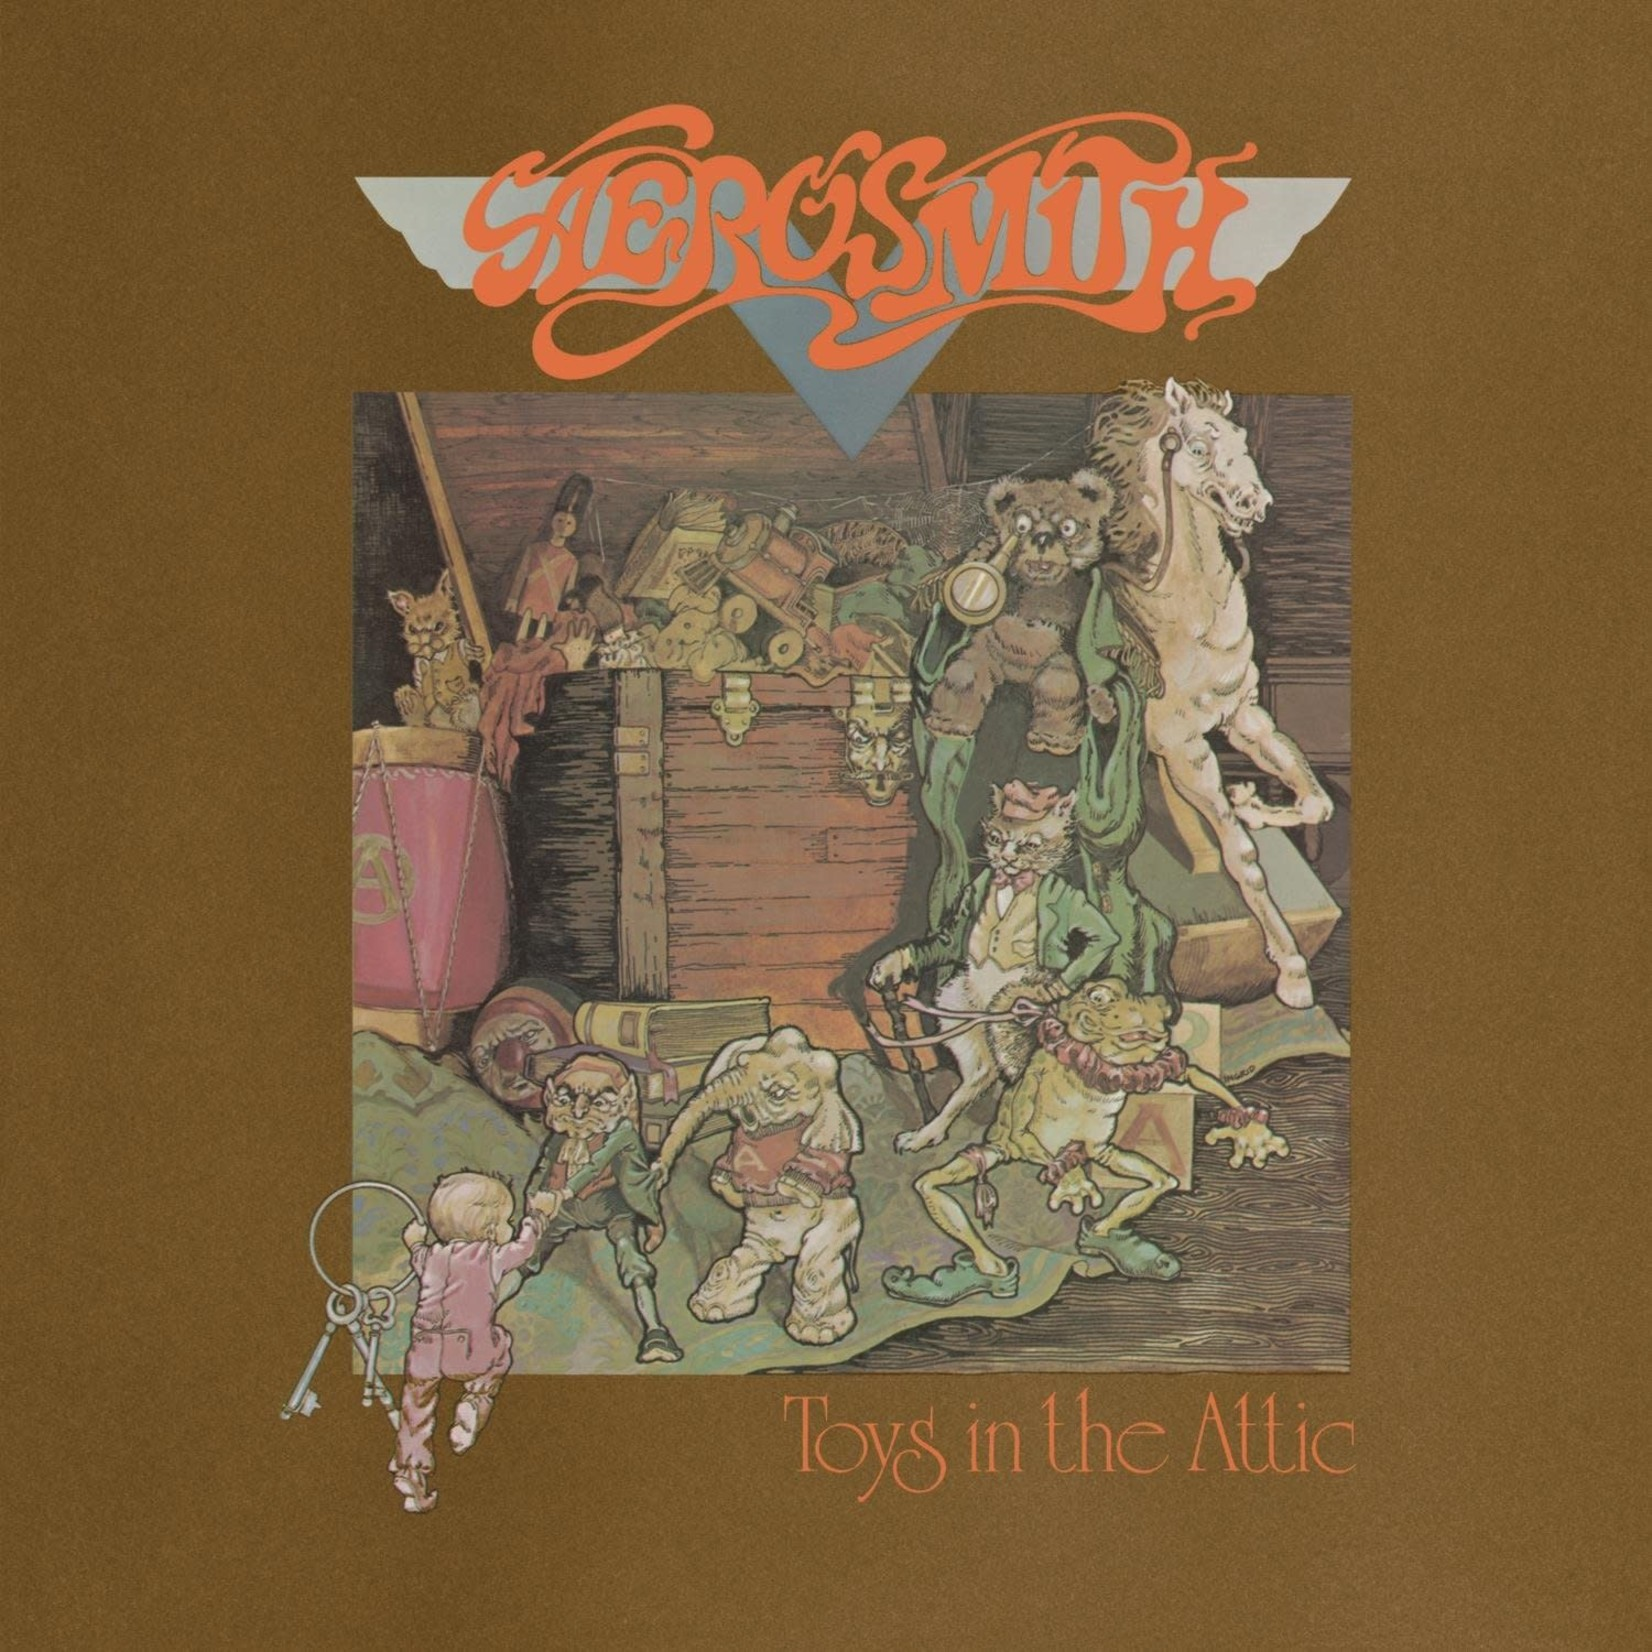 [Vintage] Aerosmith: Toys in the Attic